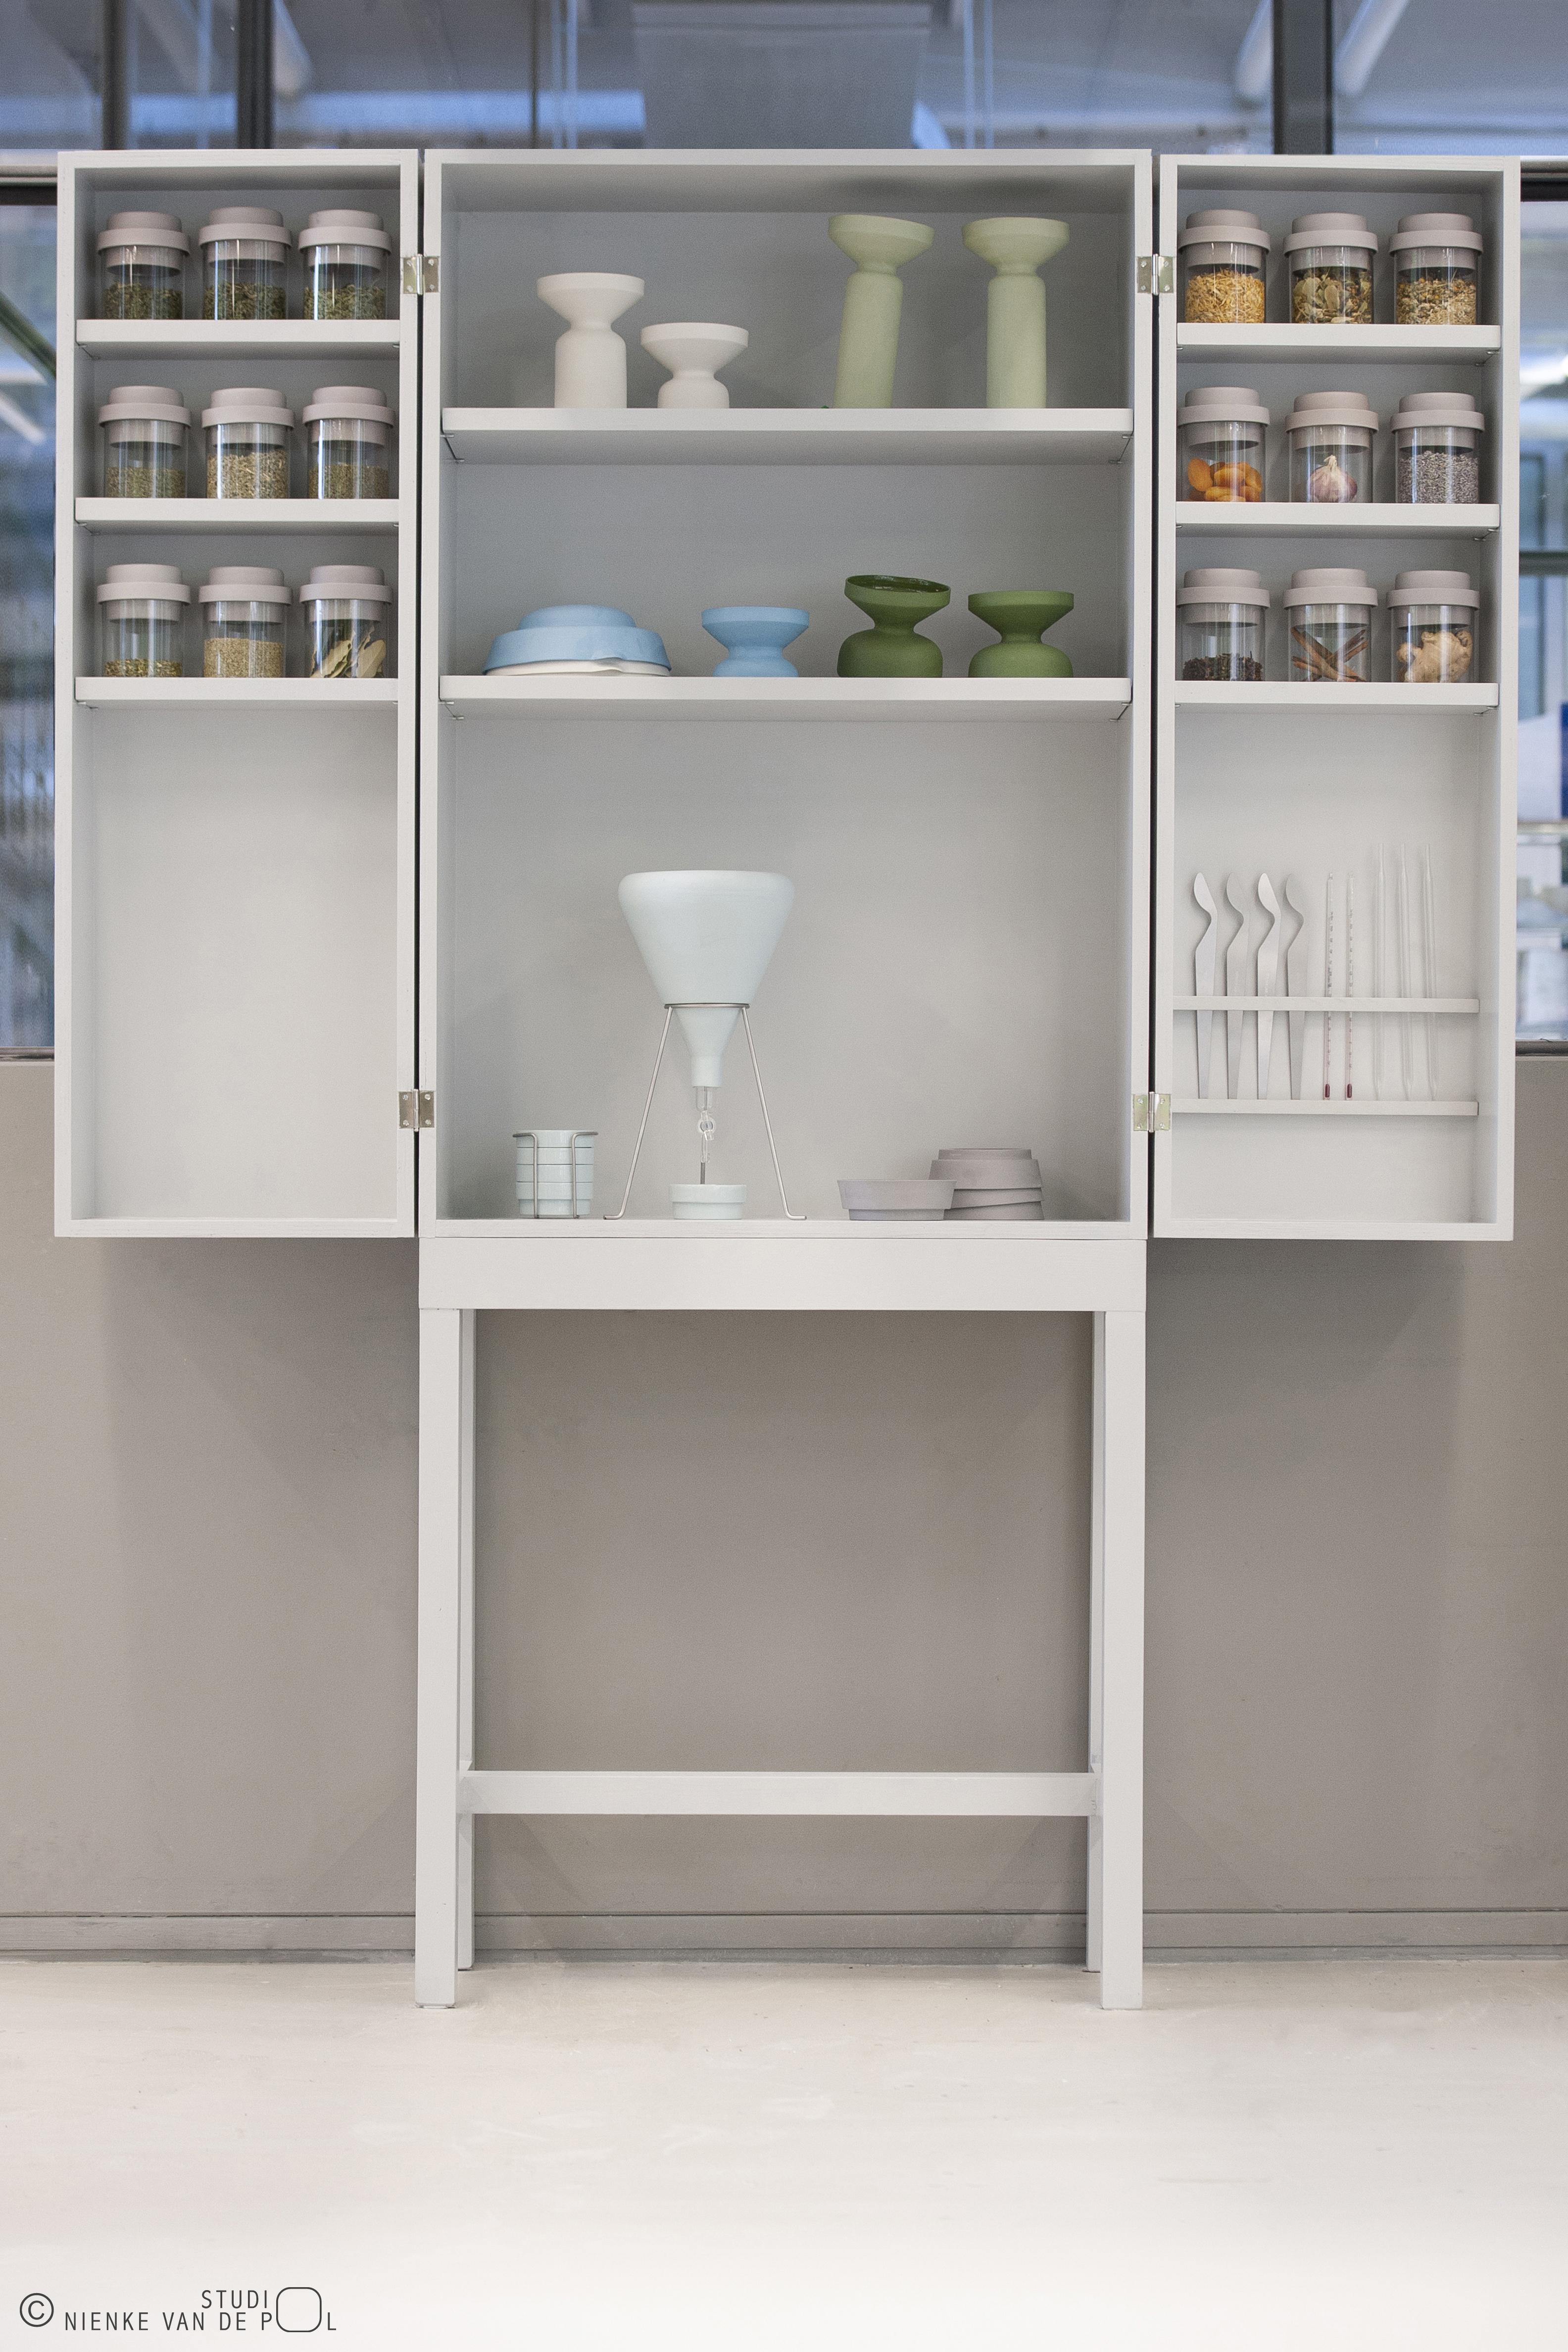 kitchenlab01-nienke-van-de-pol_c